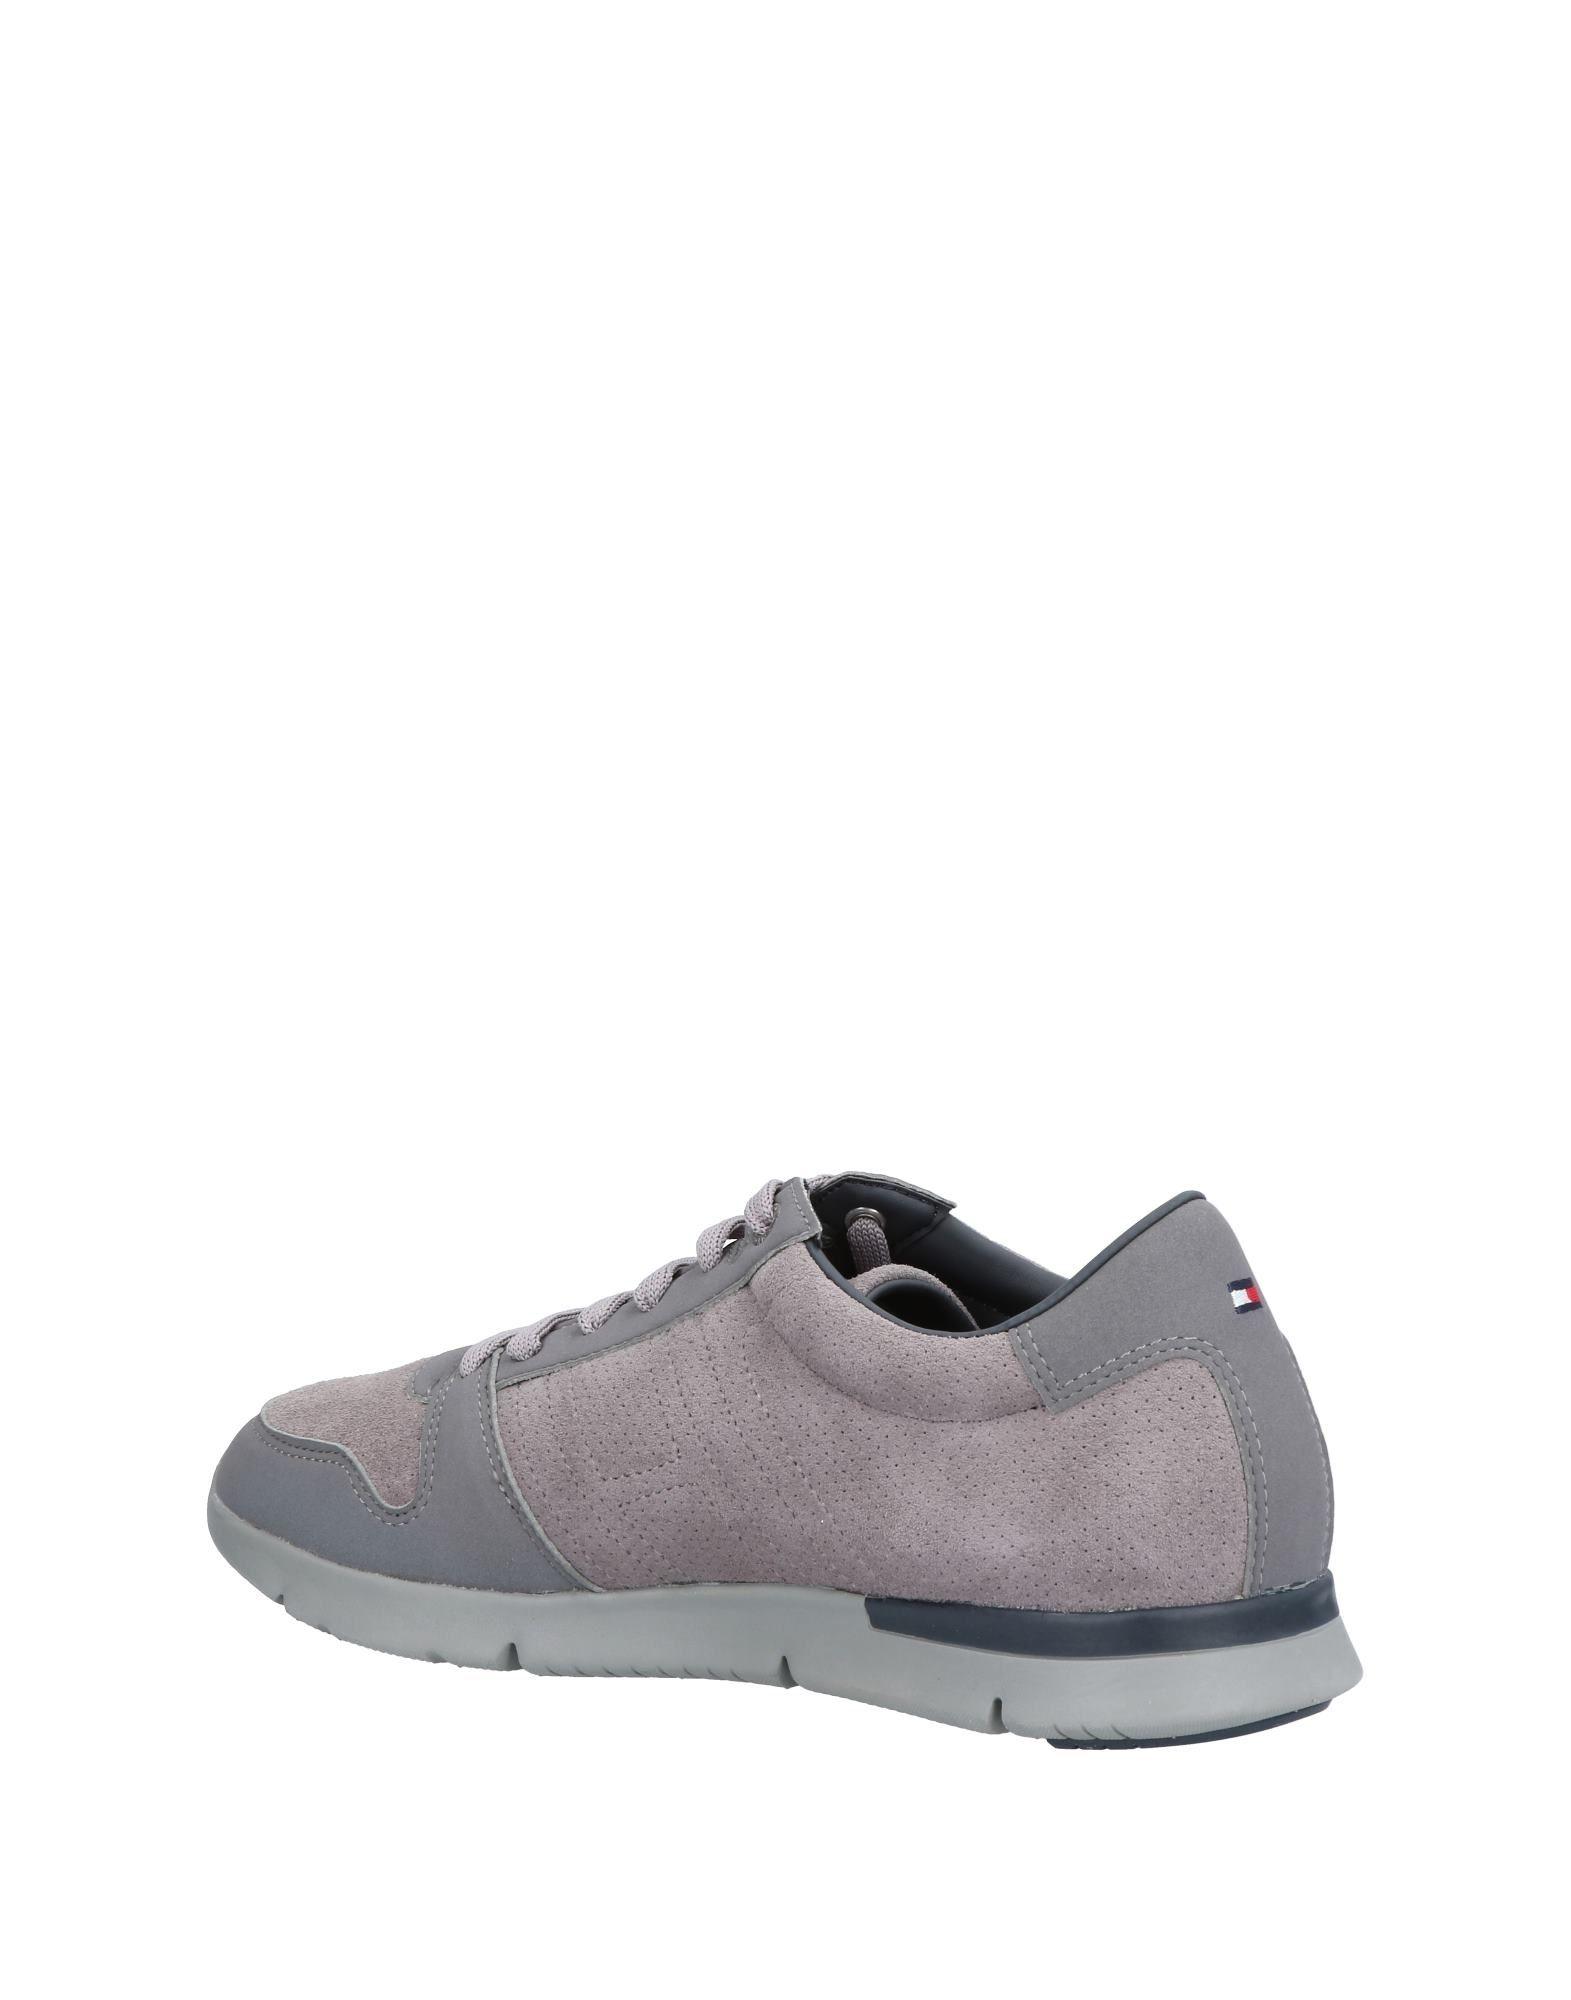 Rabatt echte Schuhe Tommy  Hilfiger Sneakers Herren  Tommy 11437795NR d3b267